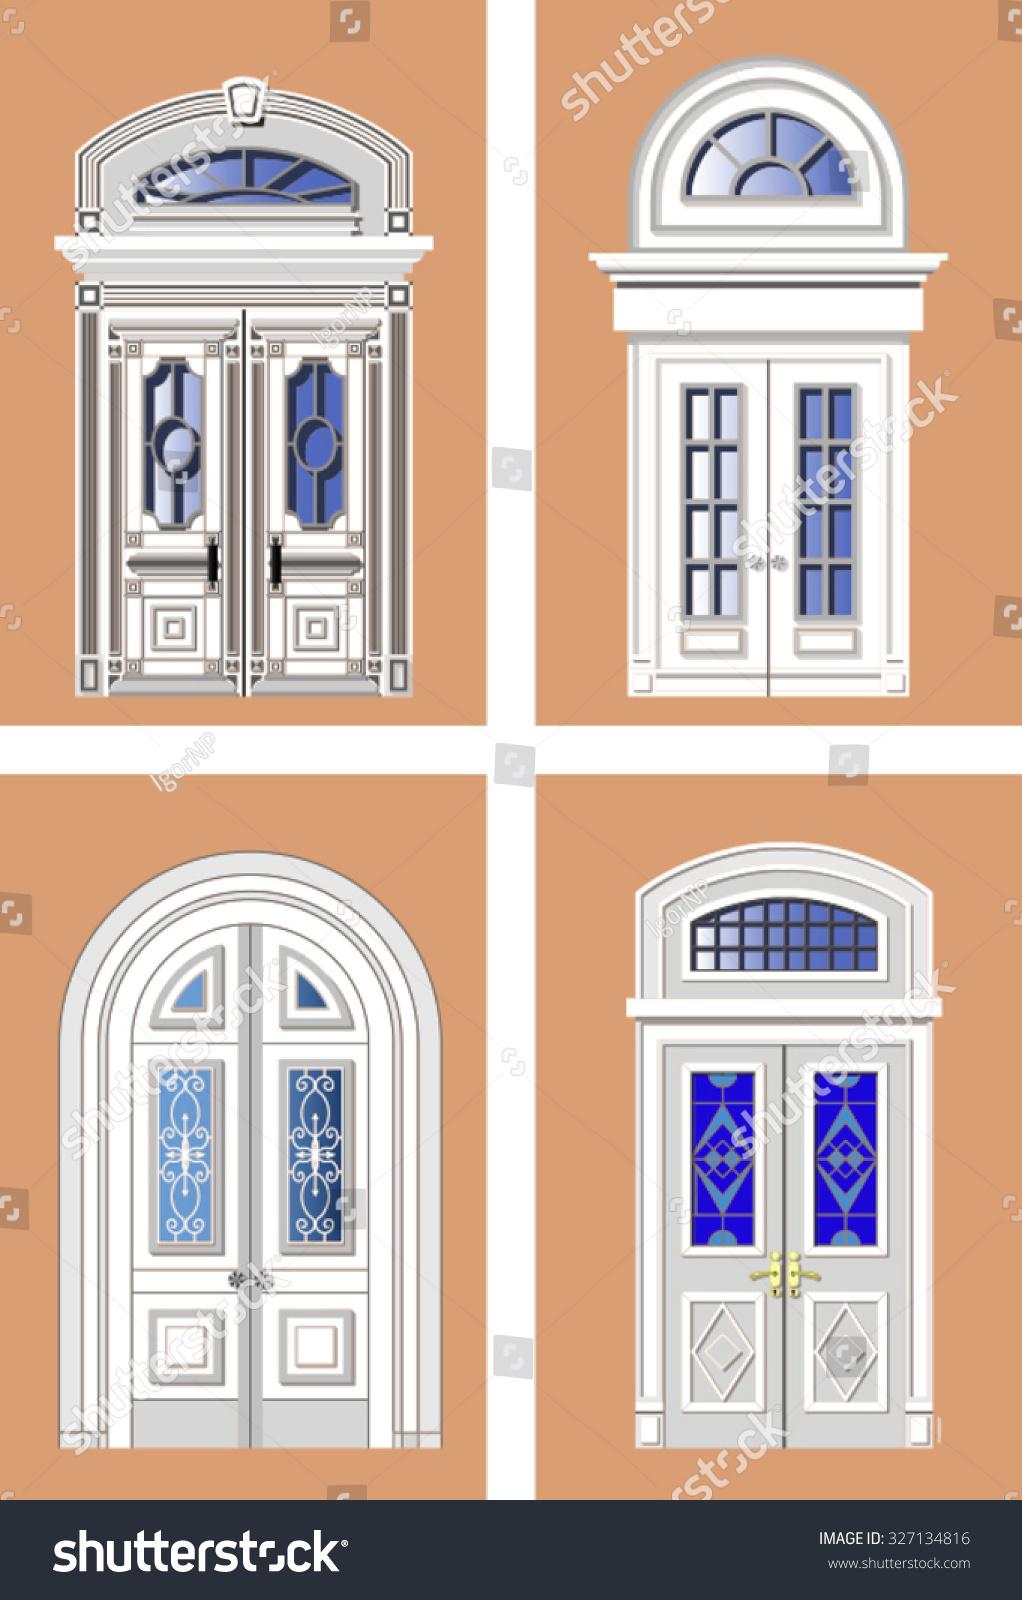 Different types of interior doors in retro style